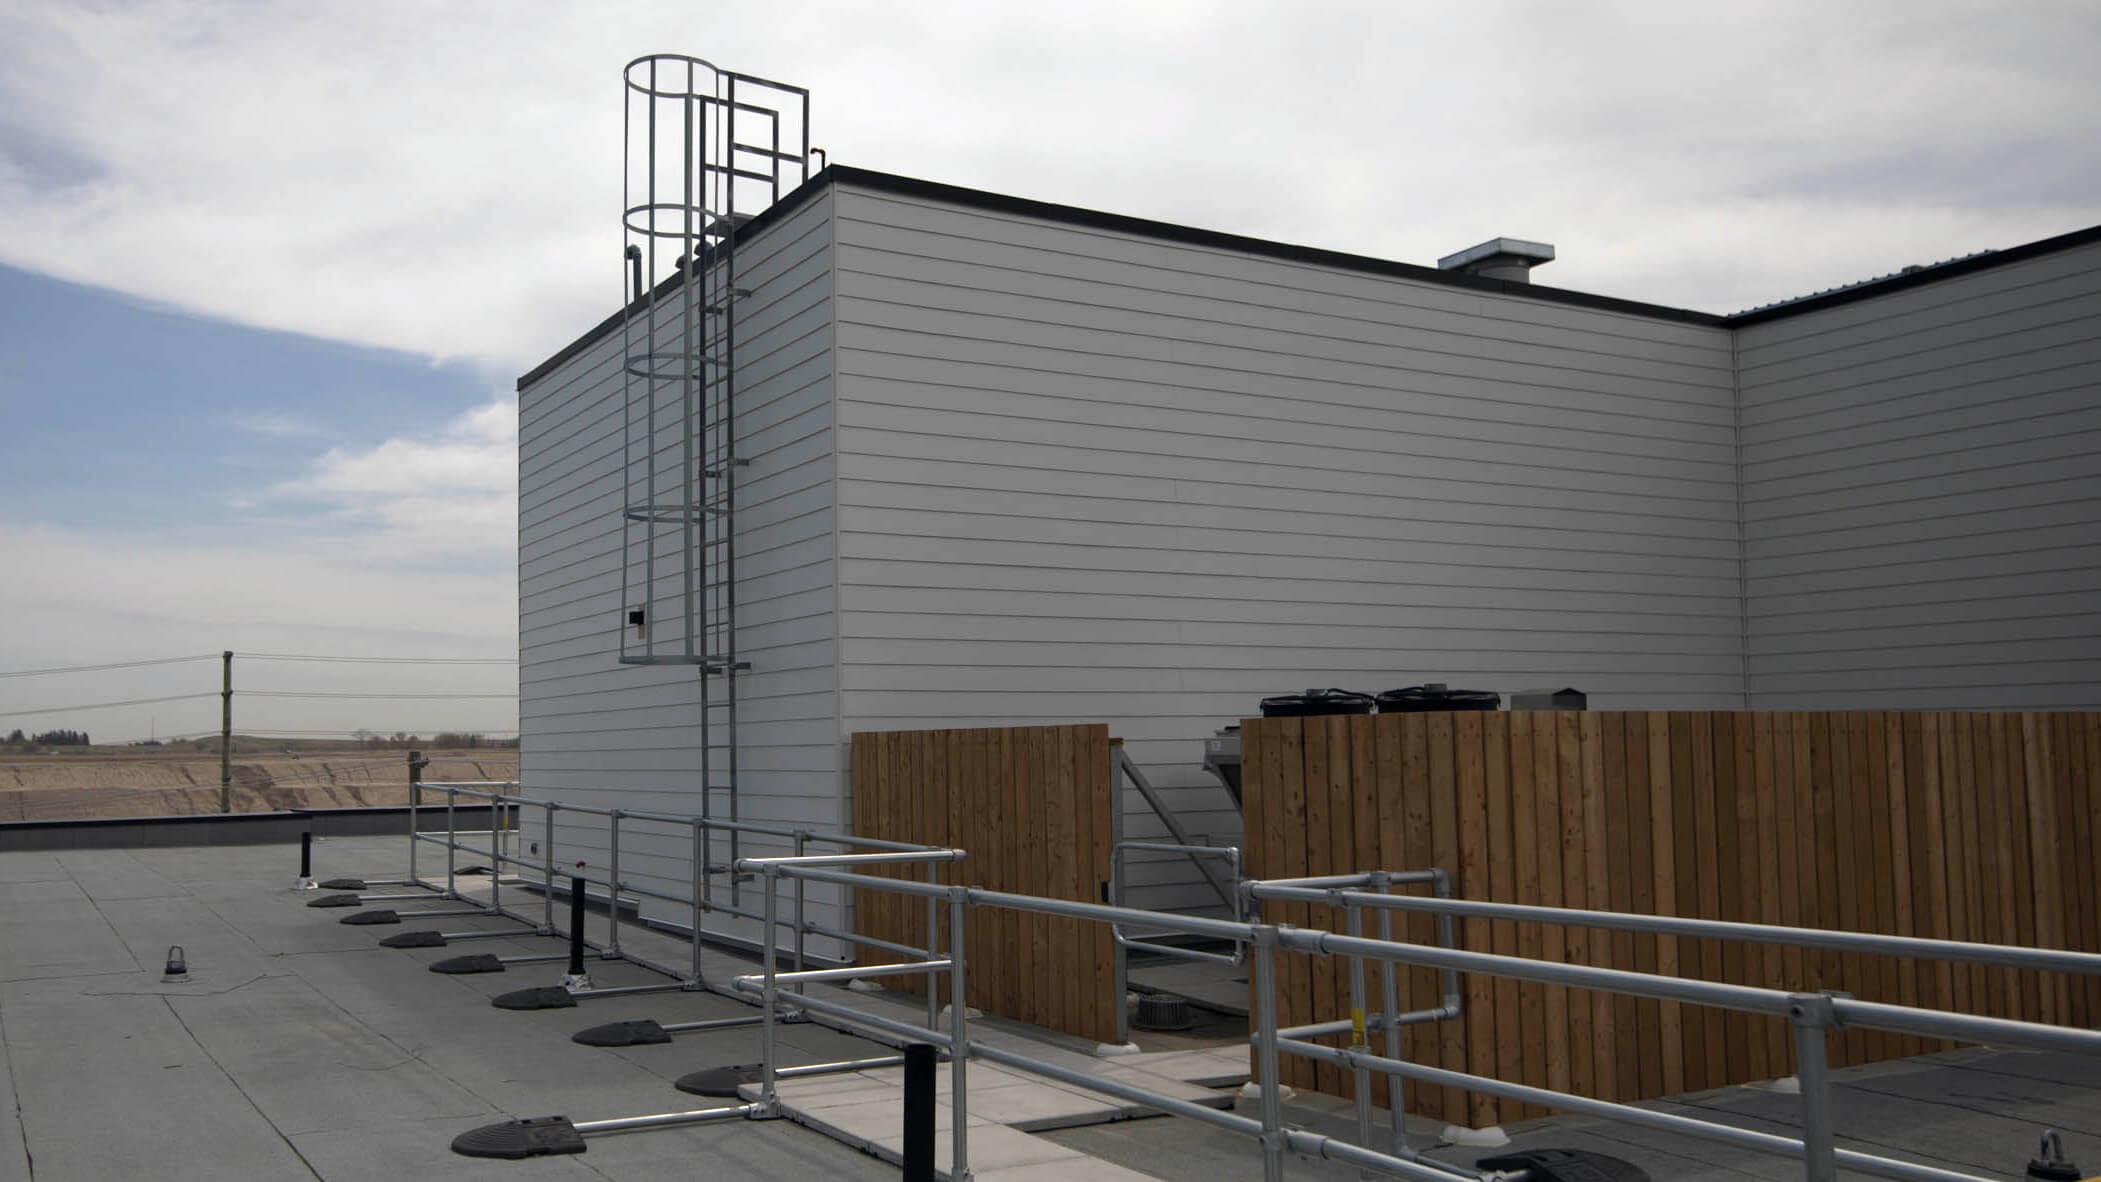 Katt Access Ladder - Secure Height Systems - Sydney (5)